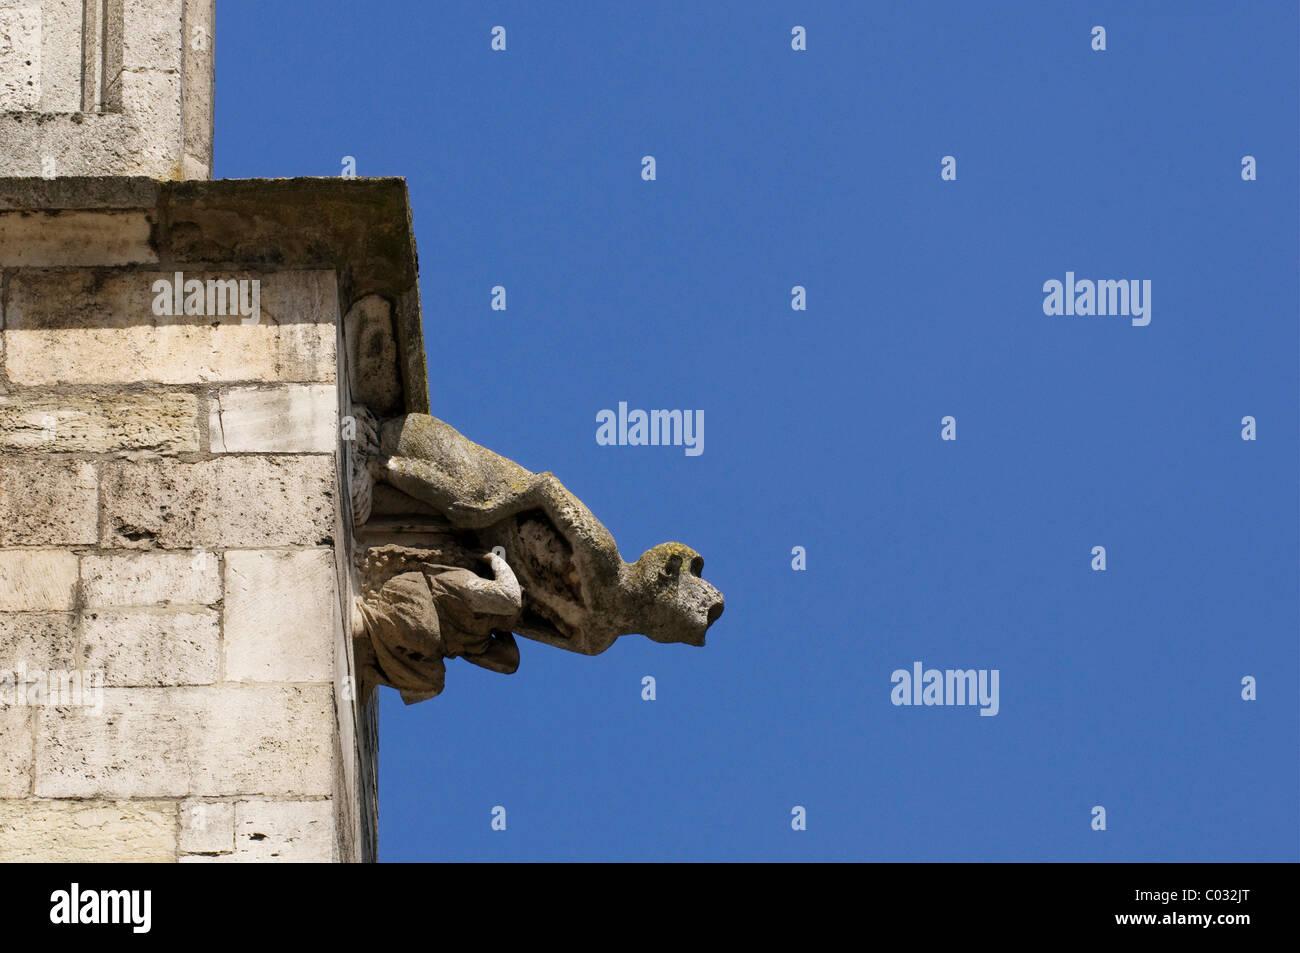 Gargoyle, monkey, sculpture on the facade of Regensburg Cathedral, Regensburg, Upper Palatinate, Bavaria, Germany, - Stock Image